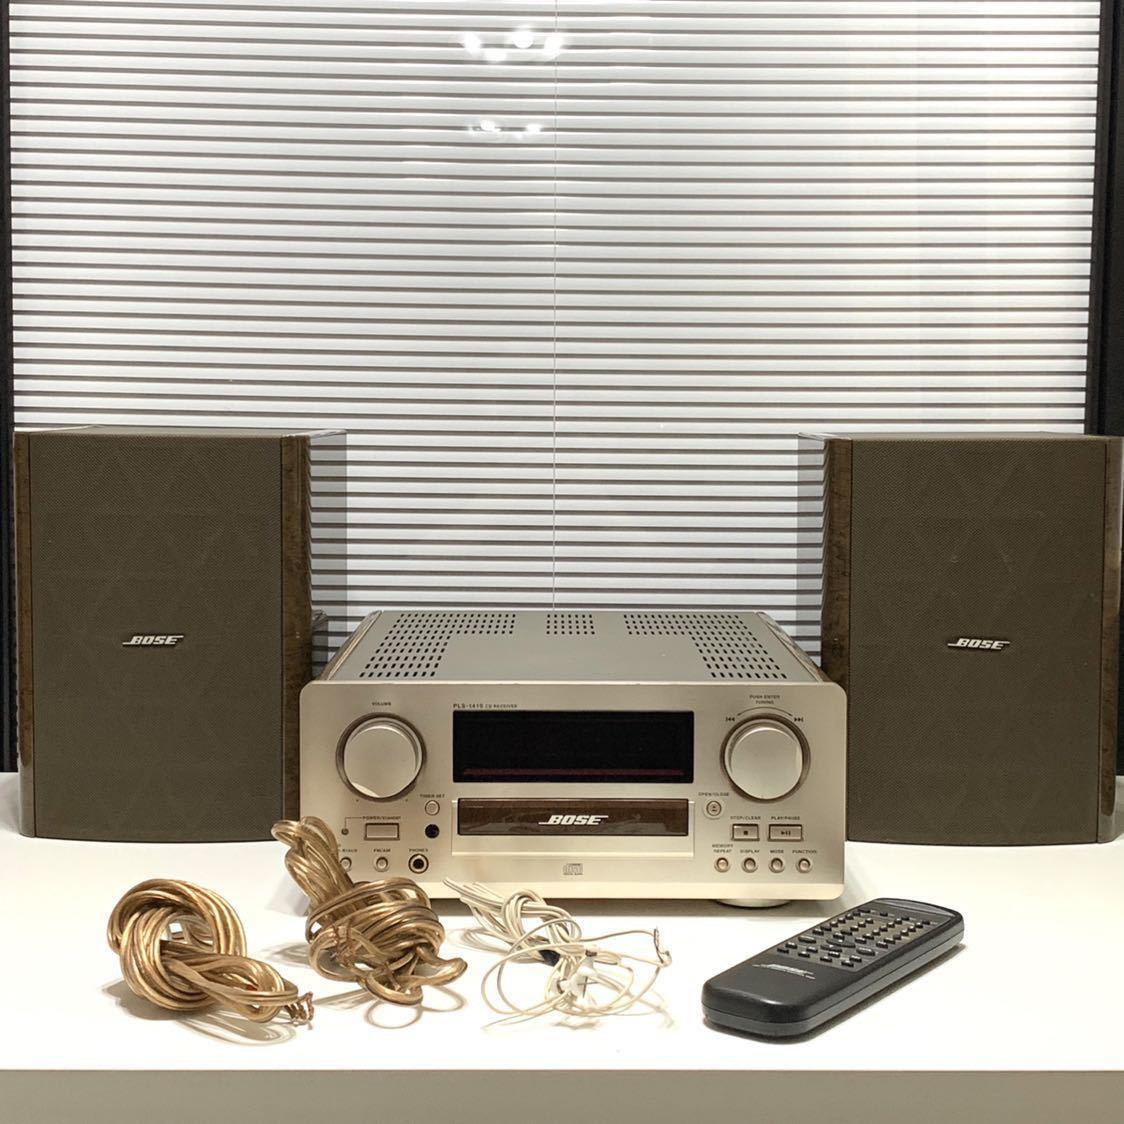 BOSE PLS-1410* power supply, speaker, radio OK*CD opening